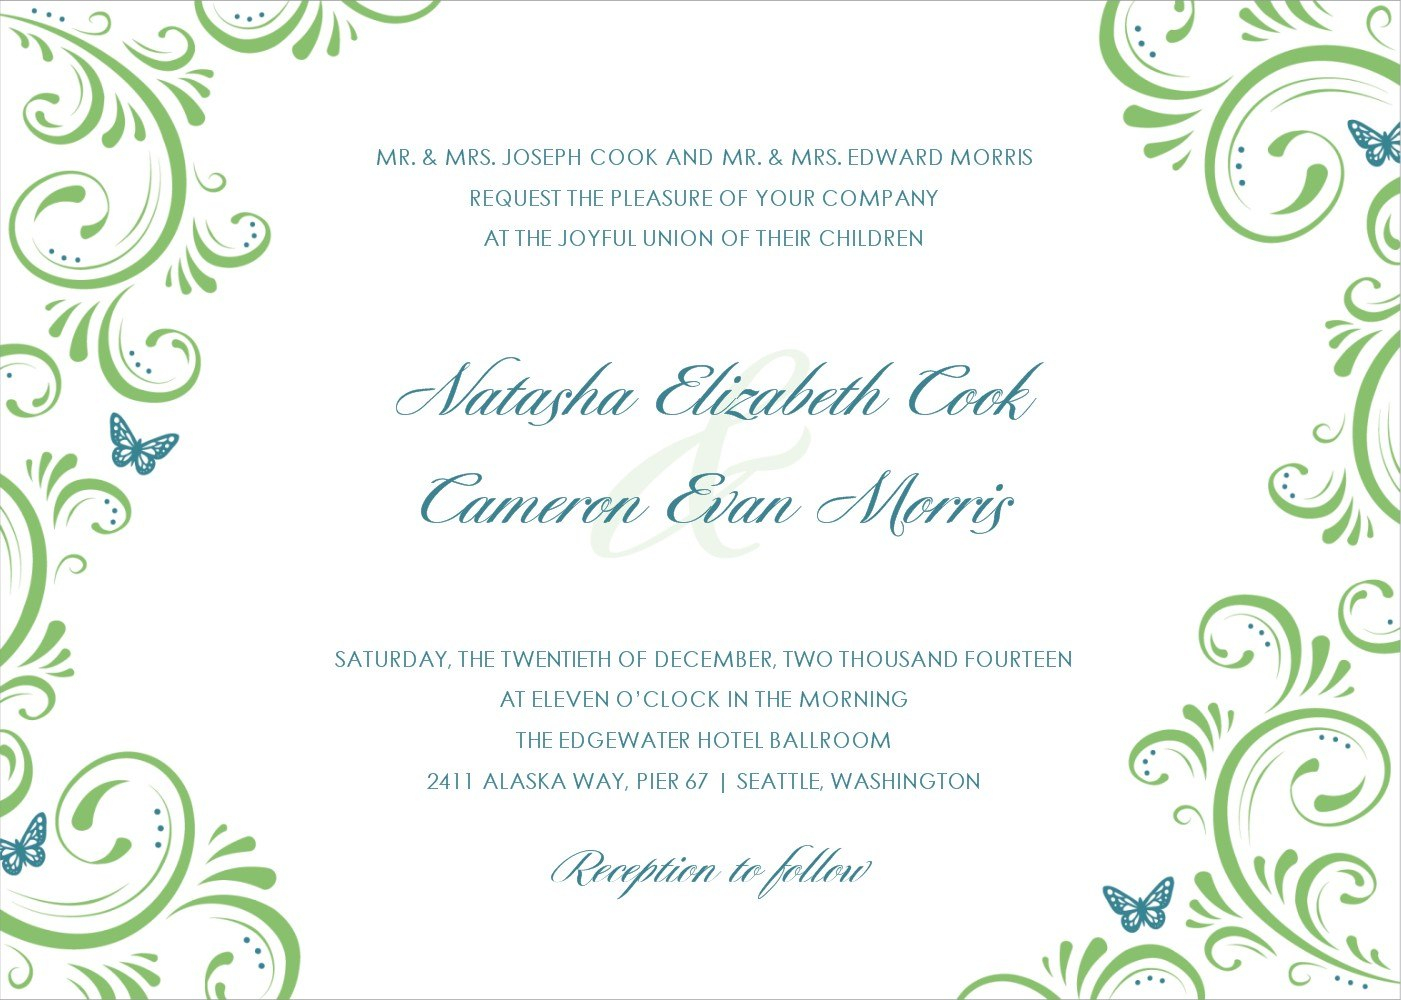 Wedding Invitation Templates Images  Free Wedding Invitation With Regard To Free E Wedding Invitation Card Templates